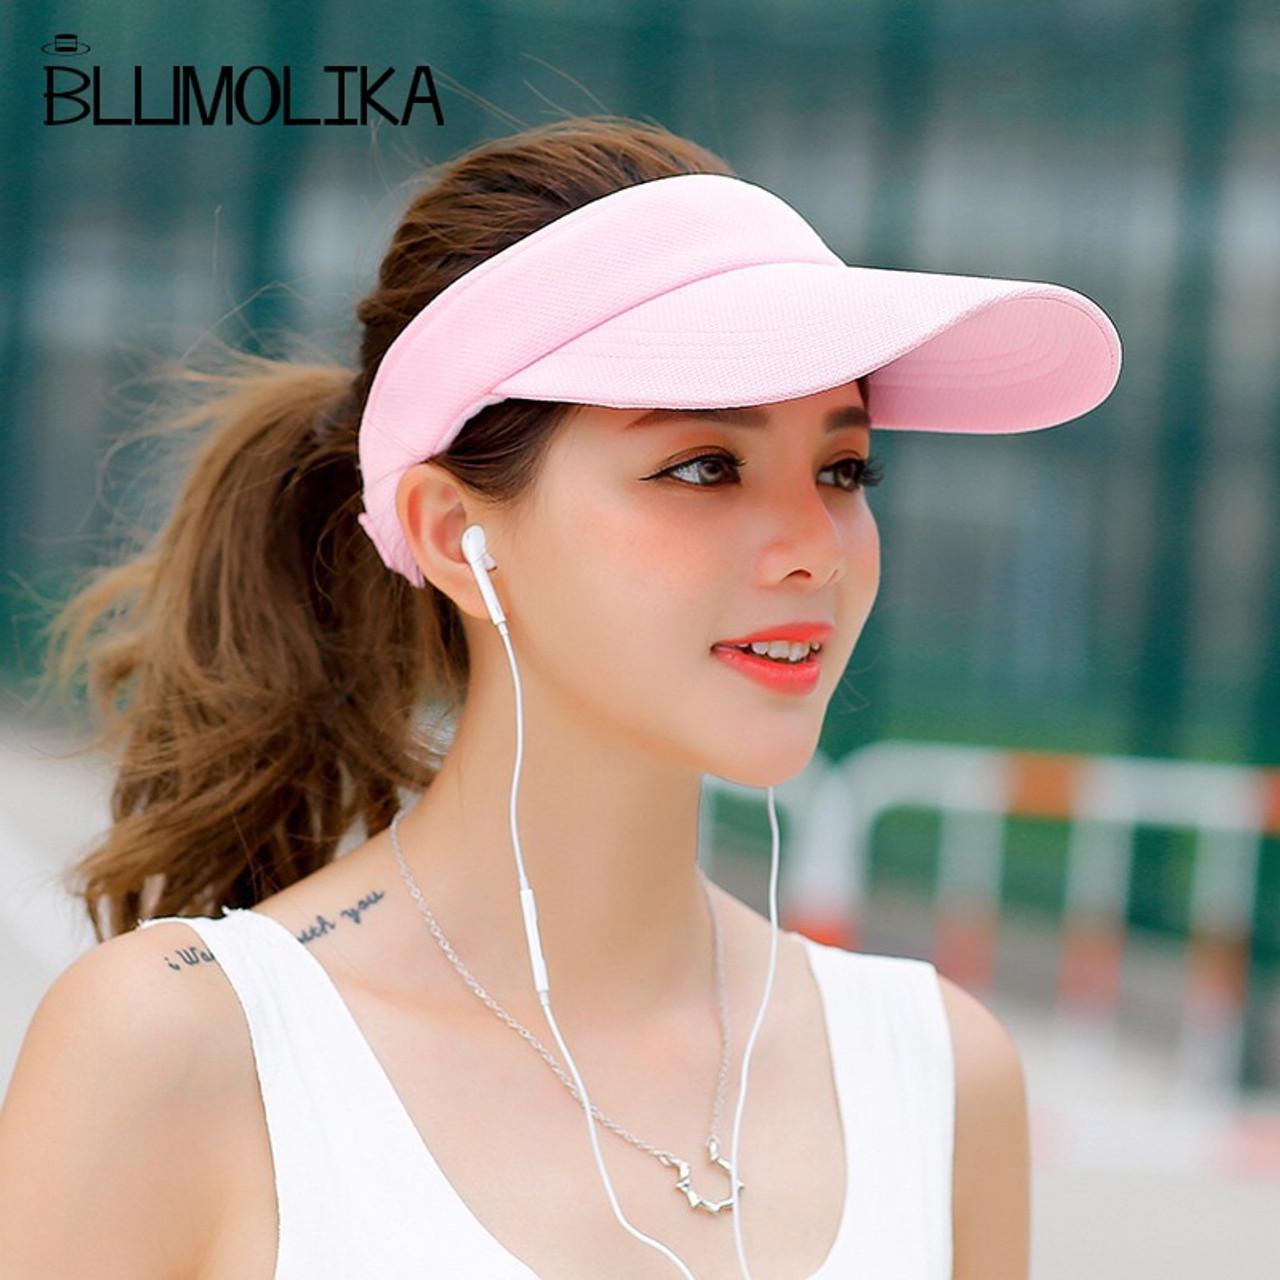 9990082b6 Hot Selling New Tennis Caps Stylish Women Men Unisex Beach Sports Sun Visor  Hat Golf Caps Summer Travel Sun Hat Outdoor On Sale